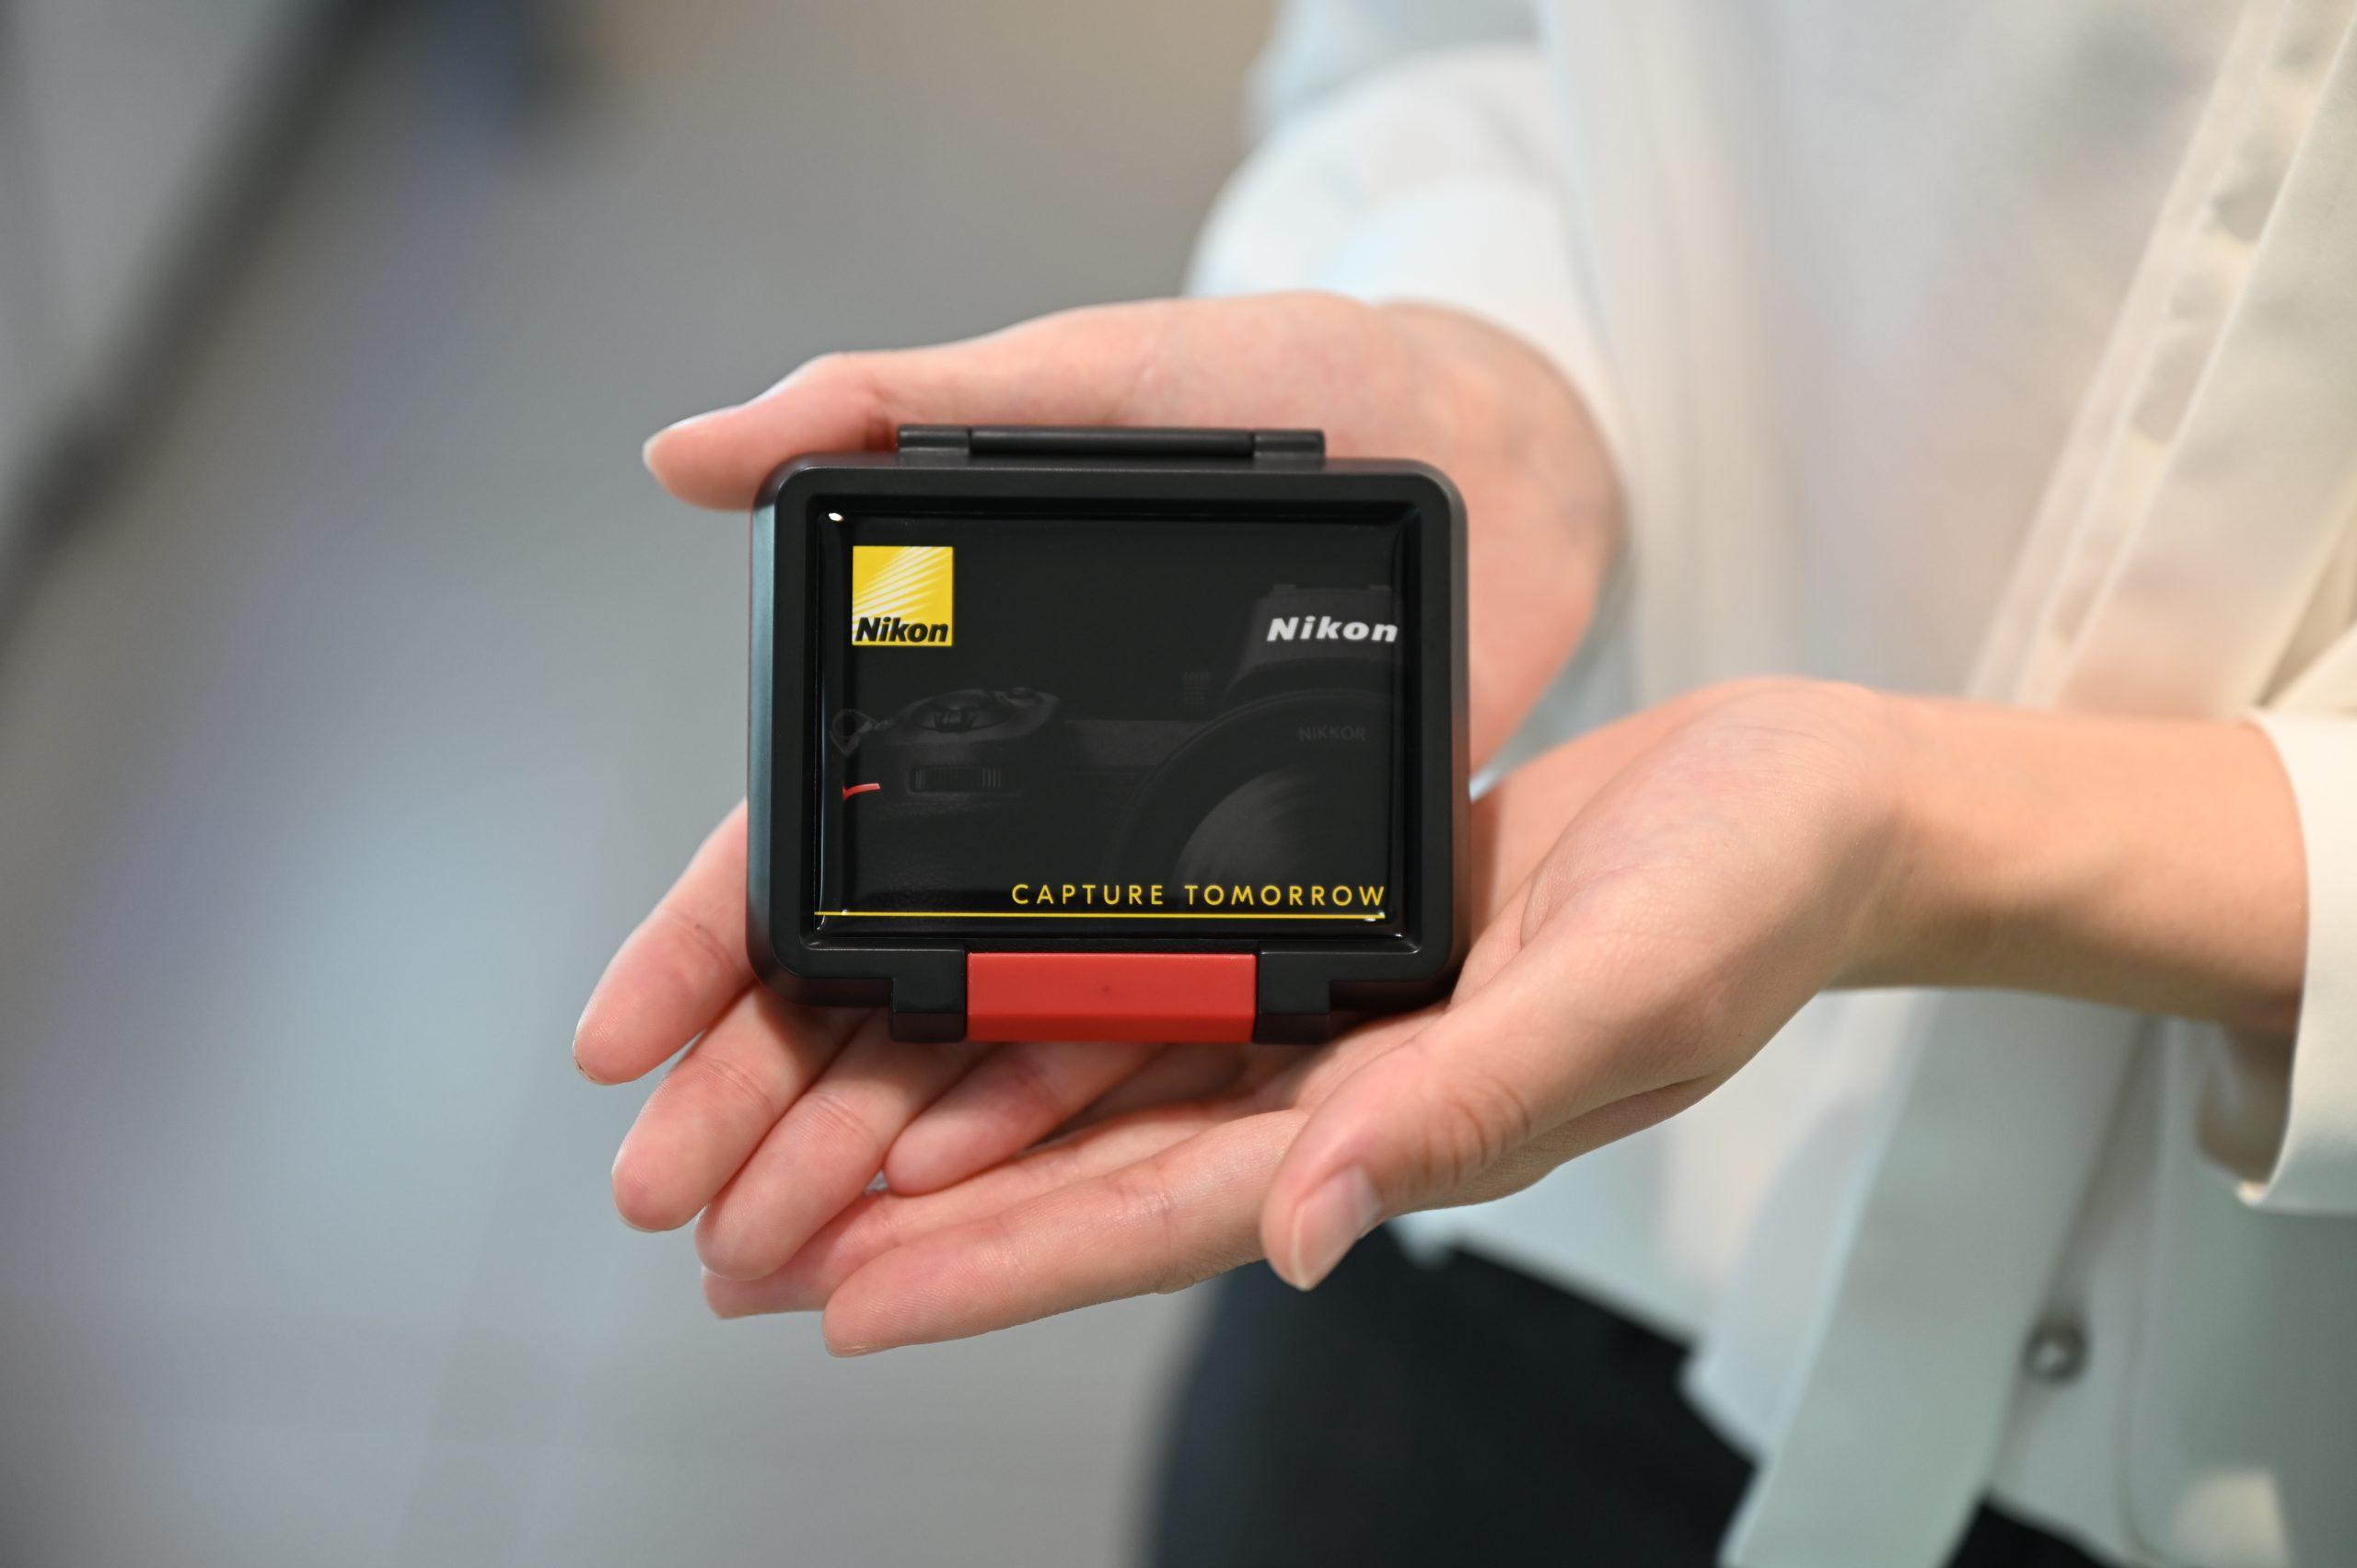 【Nikon】Nikon × Mapcamera オリジナルデザインメモリーカードケース